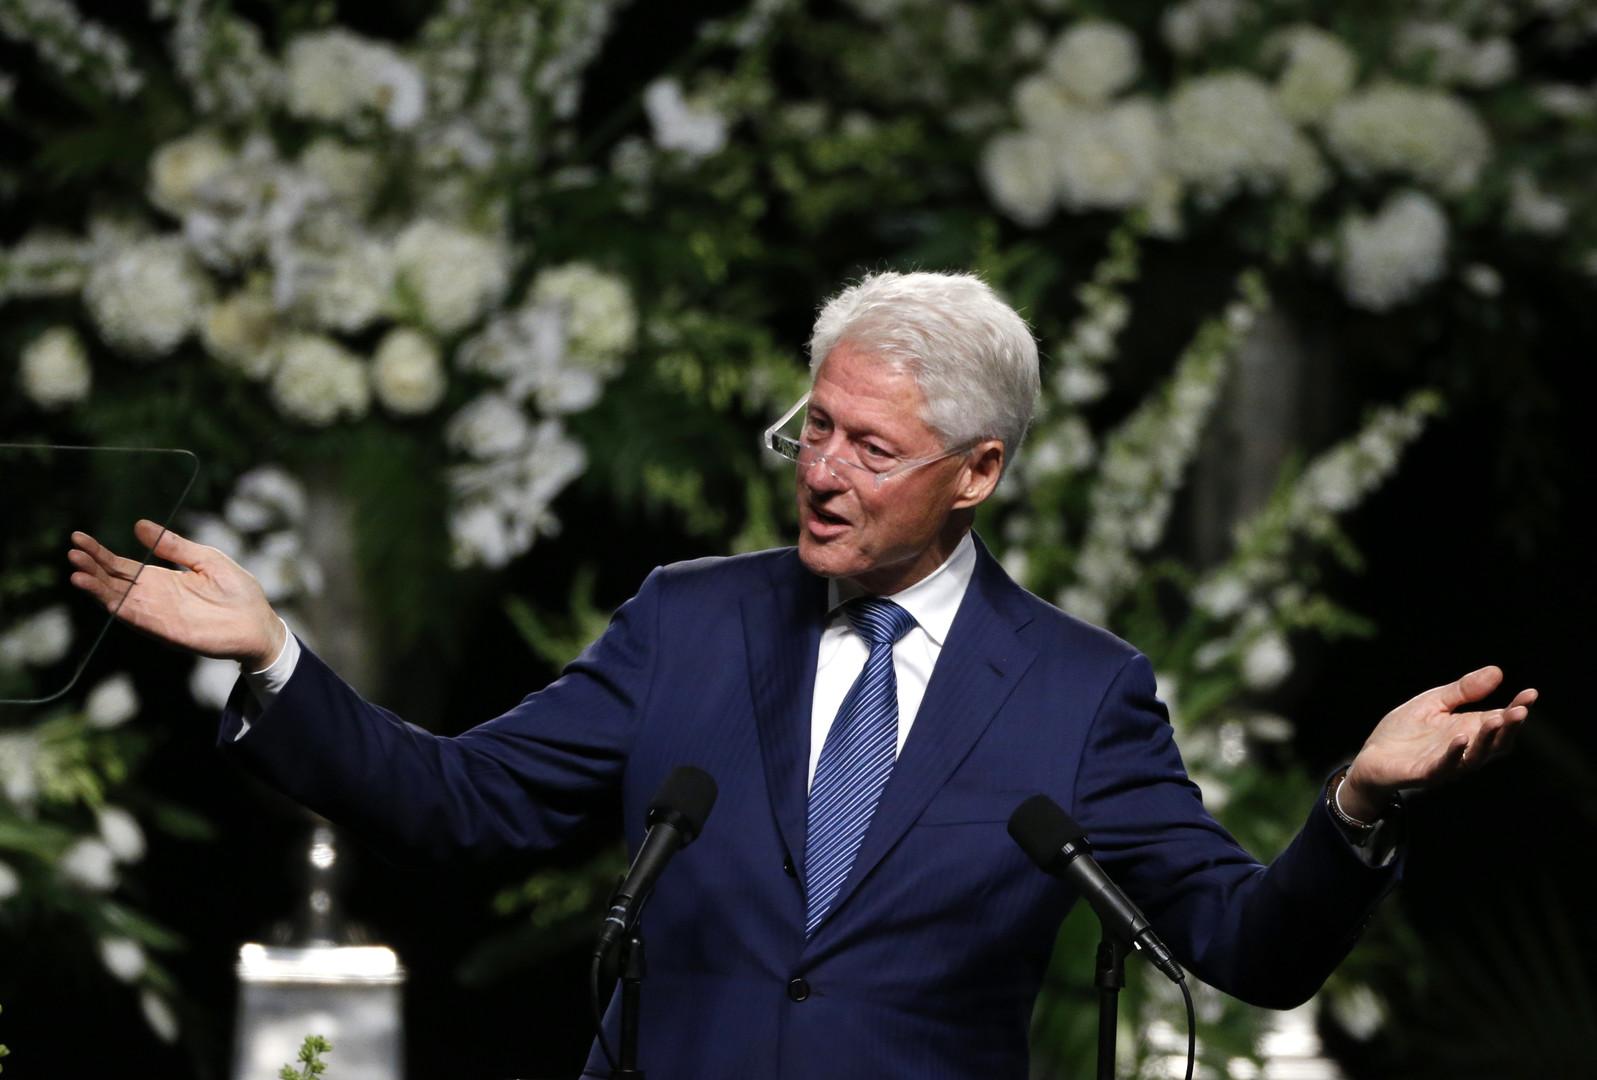 Арнольд Шварценеггер и Билл Клинтон отметились селфи на похоронах Мохаммеда Али